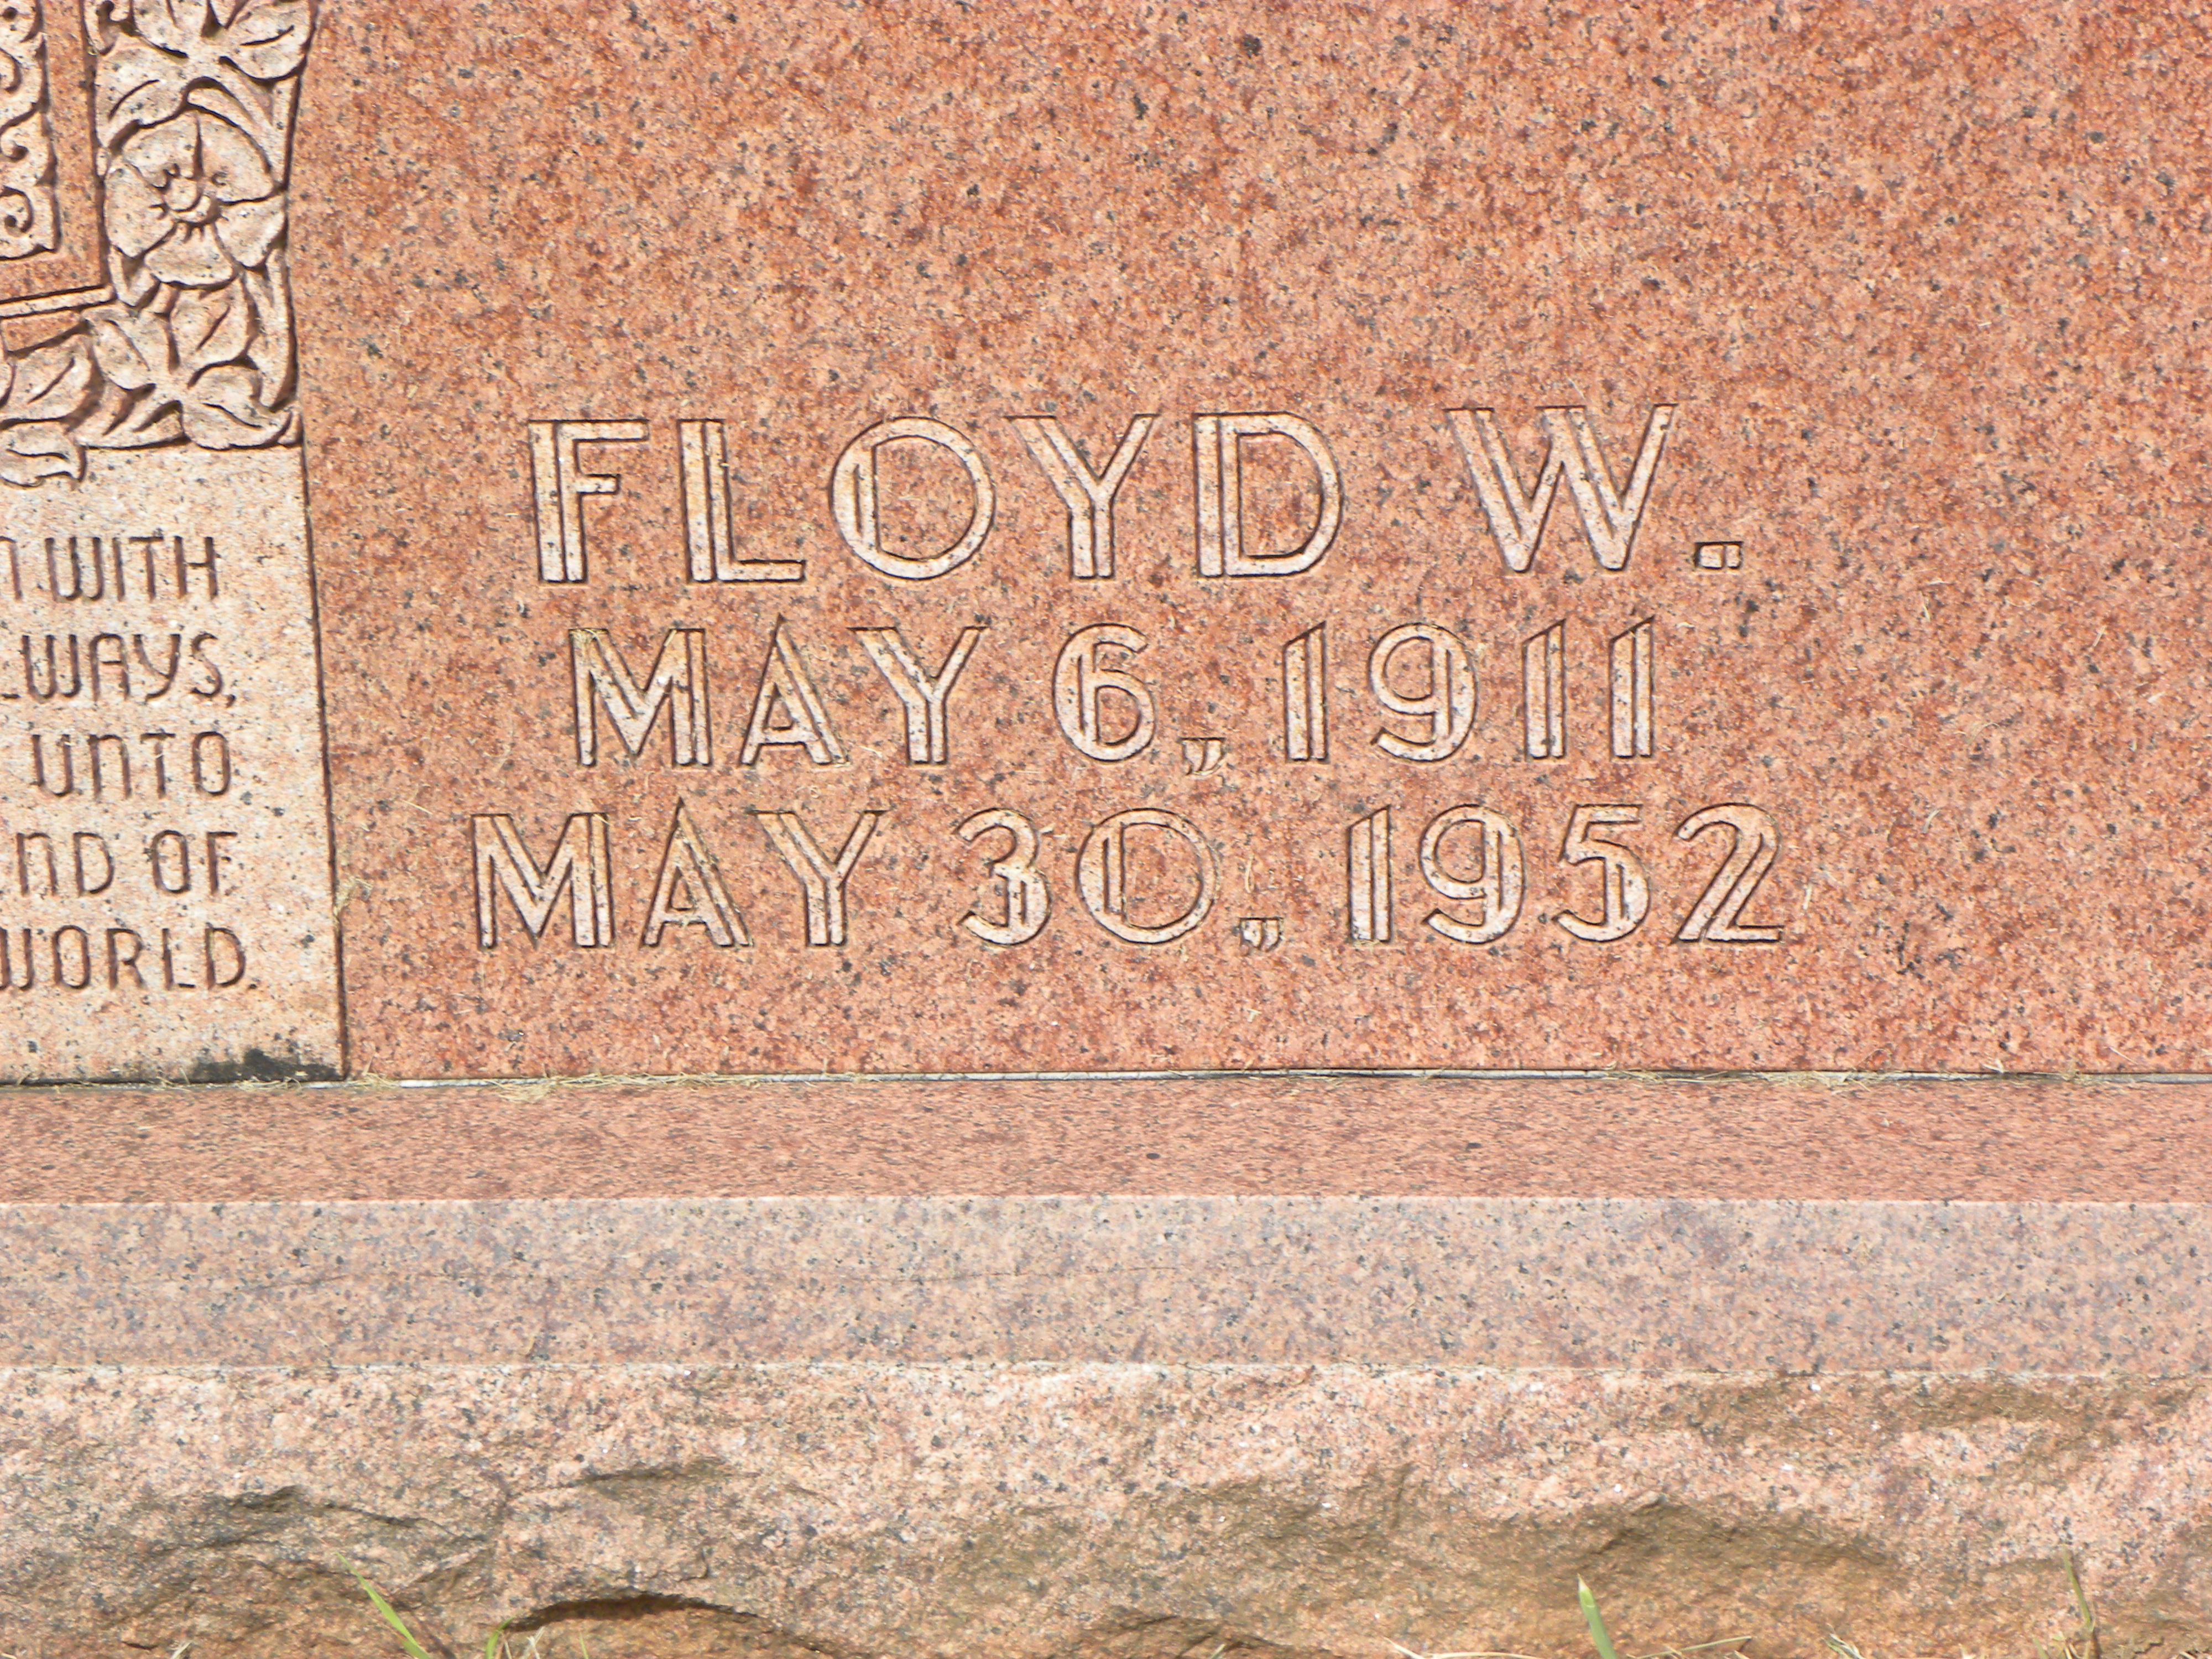 Floyd W. Brown